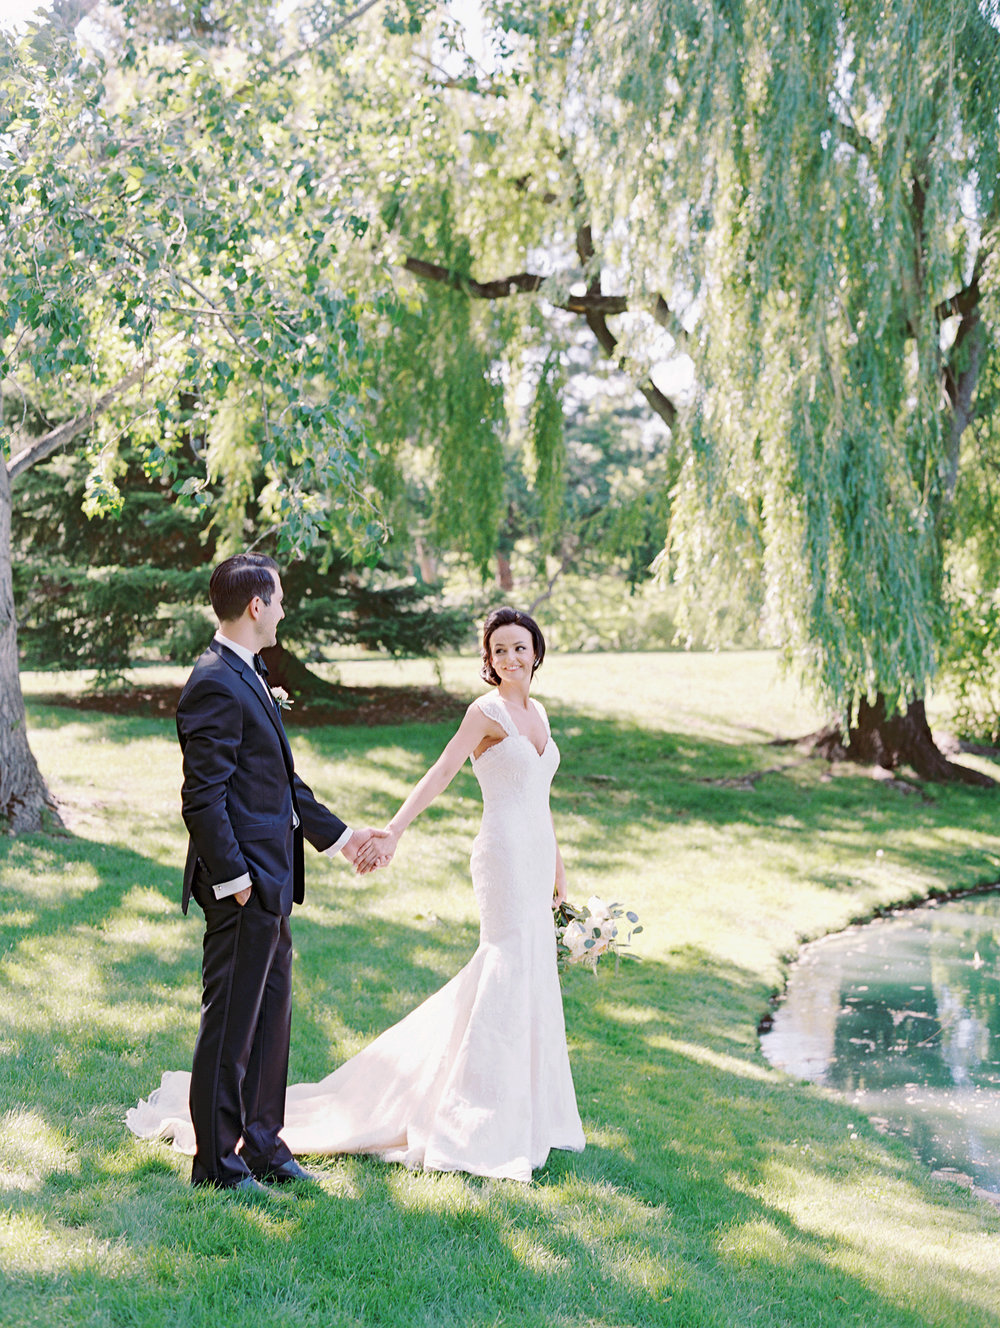 Little White Dress Bridal Shop, Denver Bridal Gown Shop, Denver Wedding Dress, Denver Wedding Alterations, Matthew Christopher Colorado, Love Veils Colorado, Veils Denver Colorado,